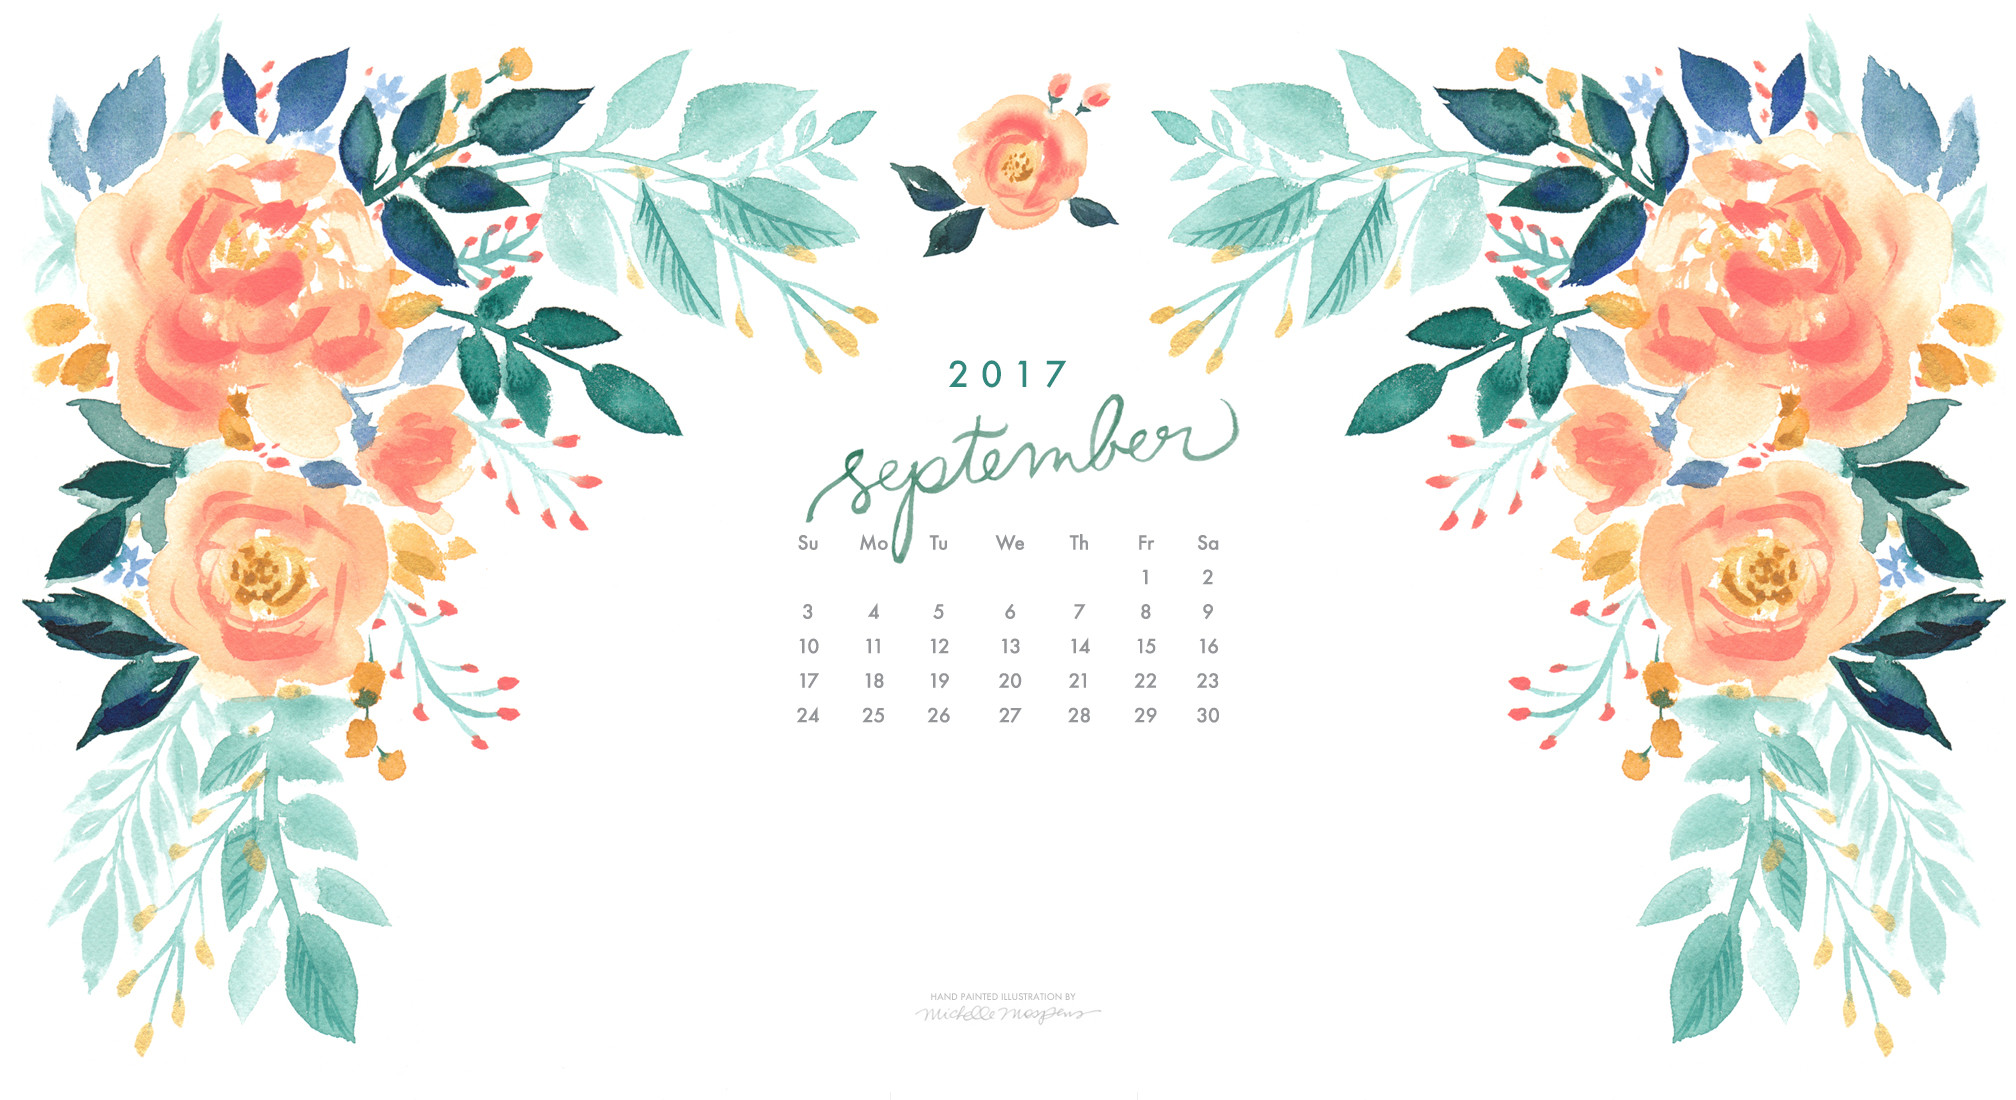 Pretty peach blooms watercolor September 2017 calendar wallpaper for your  computer. 100% original art